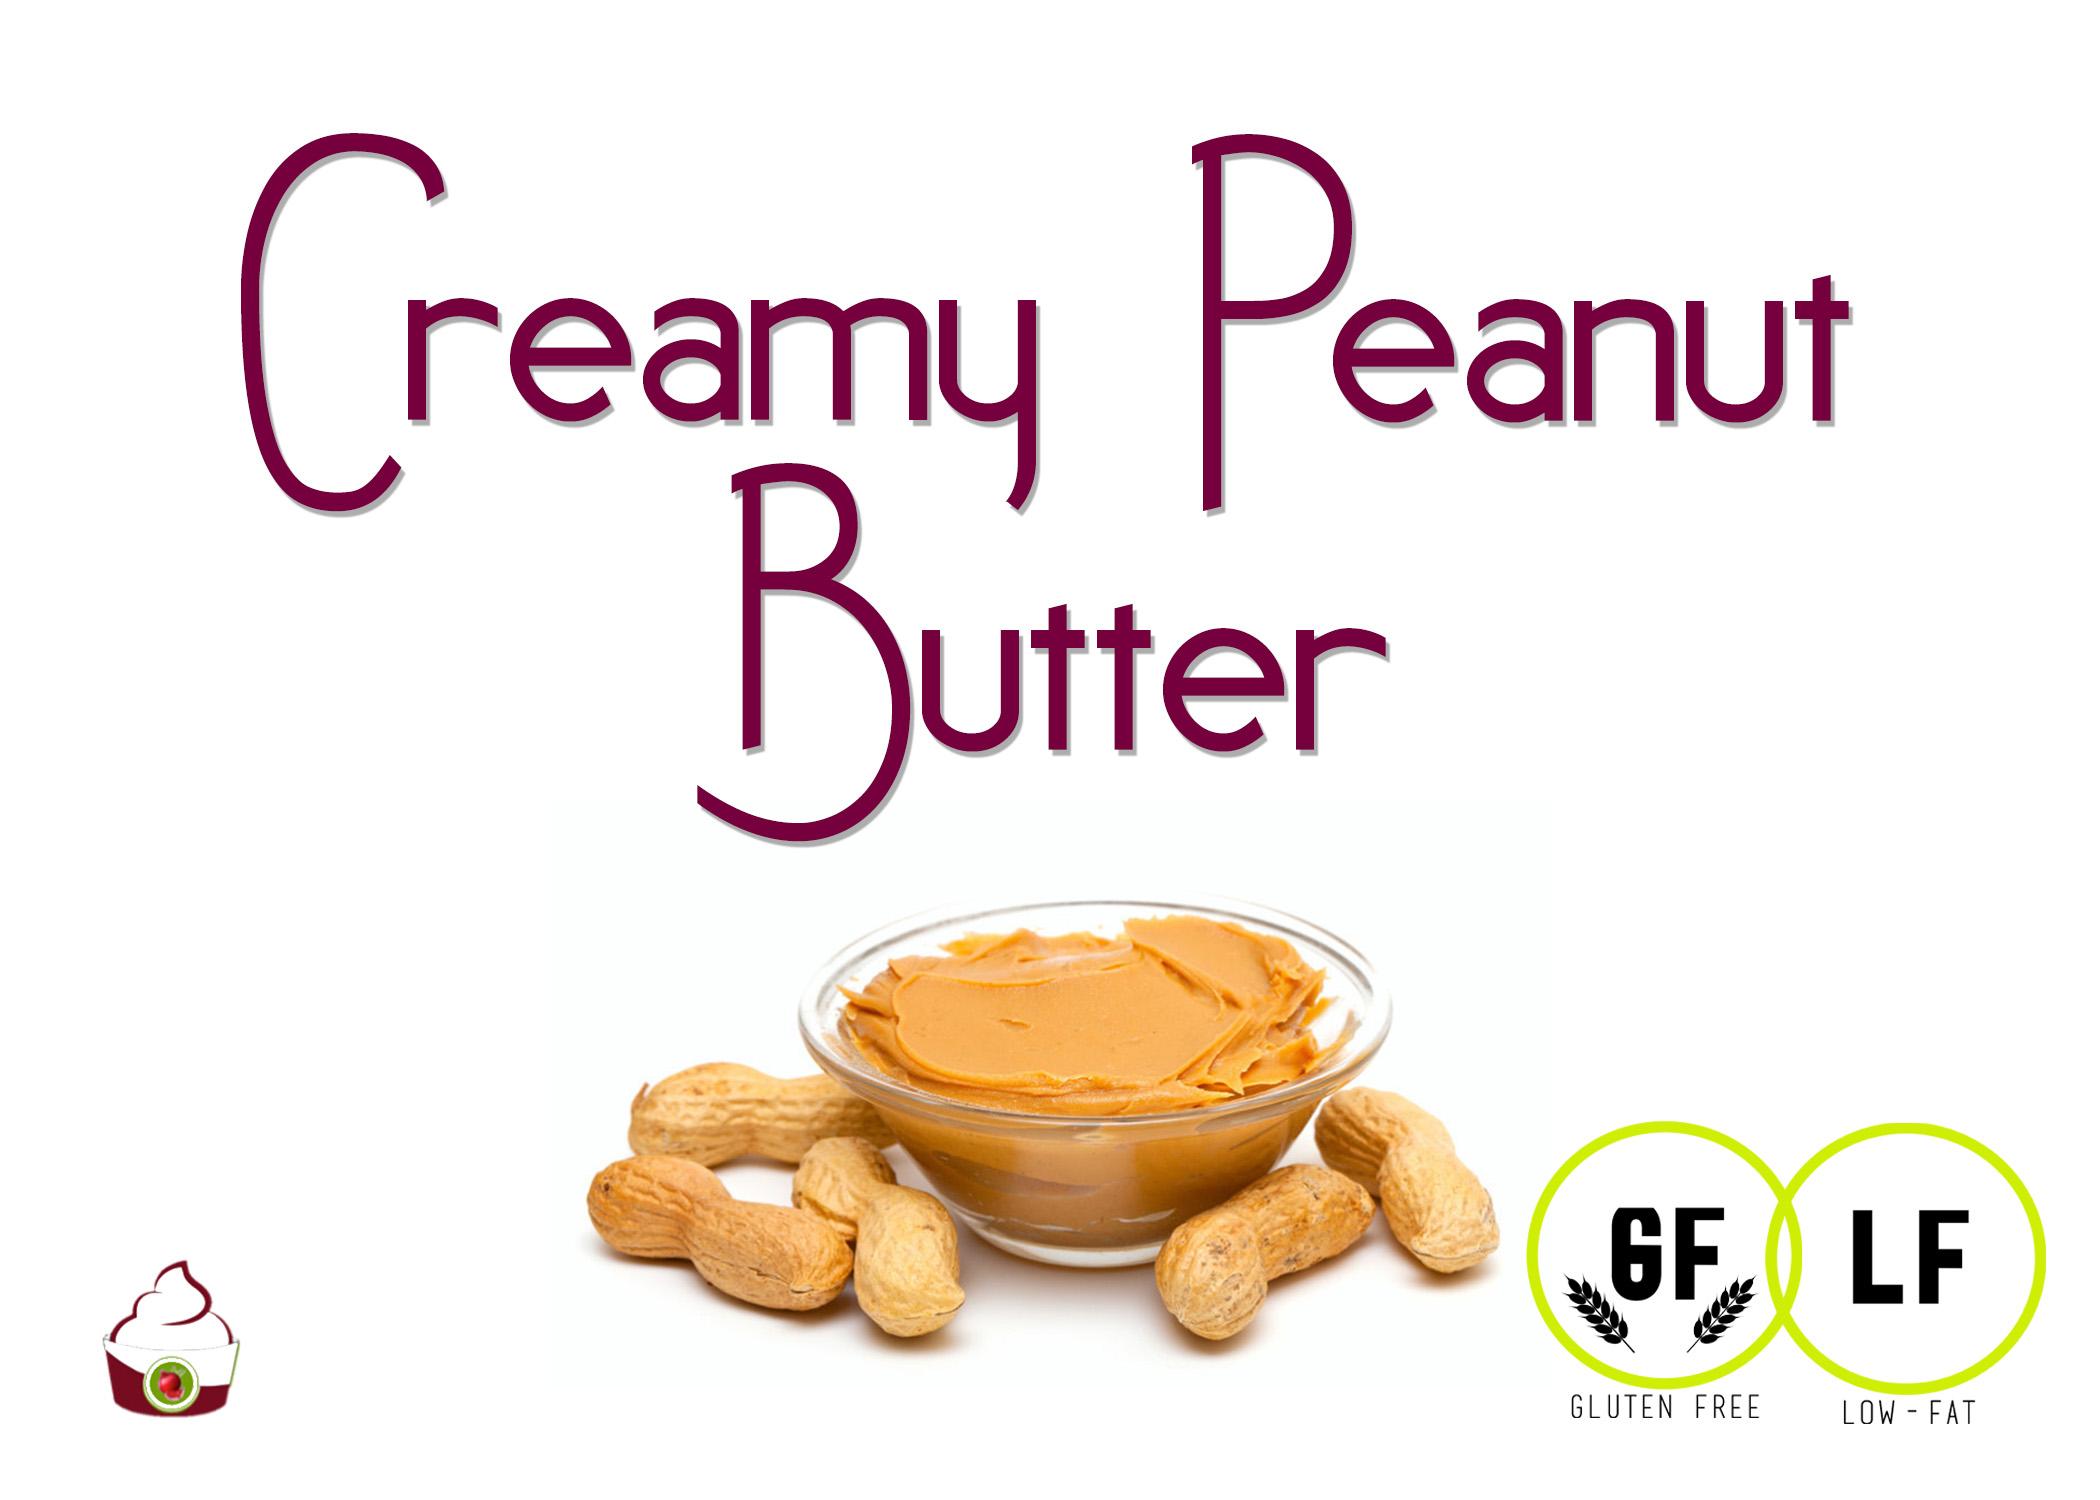 creamy peanut butter.jpg